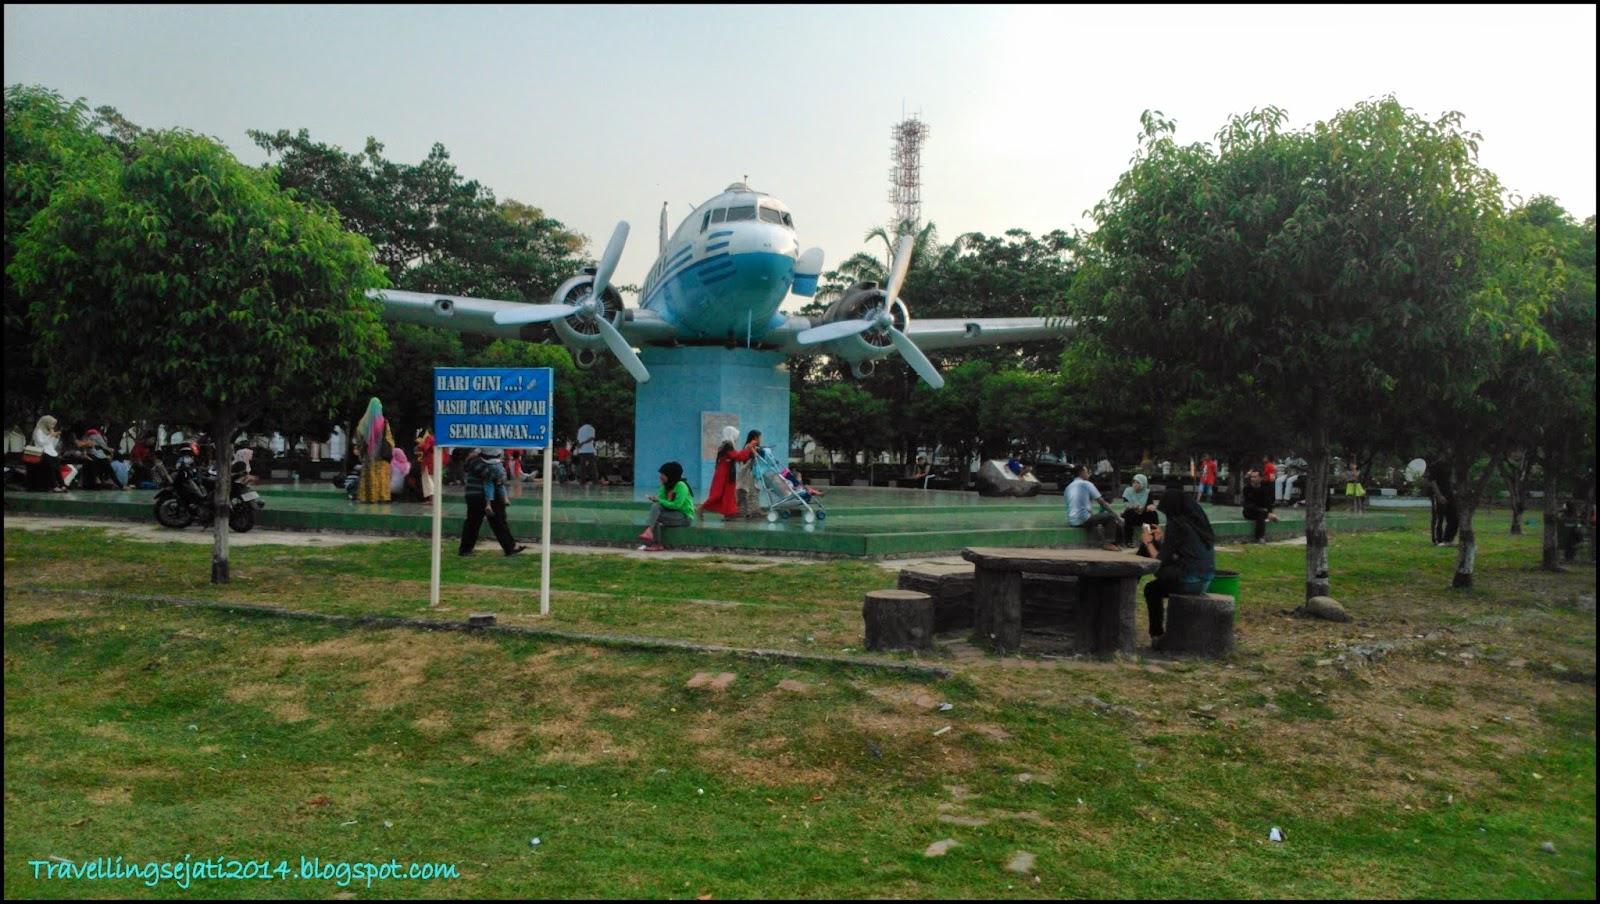 Lapangan Bersejarah Terletak Pusat Kota Banda Aceh Replika Pesawat Dakota